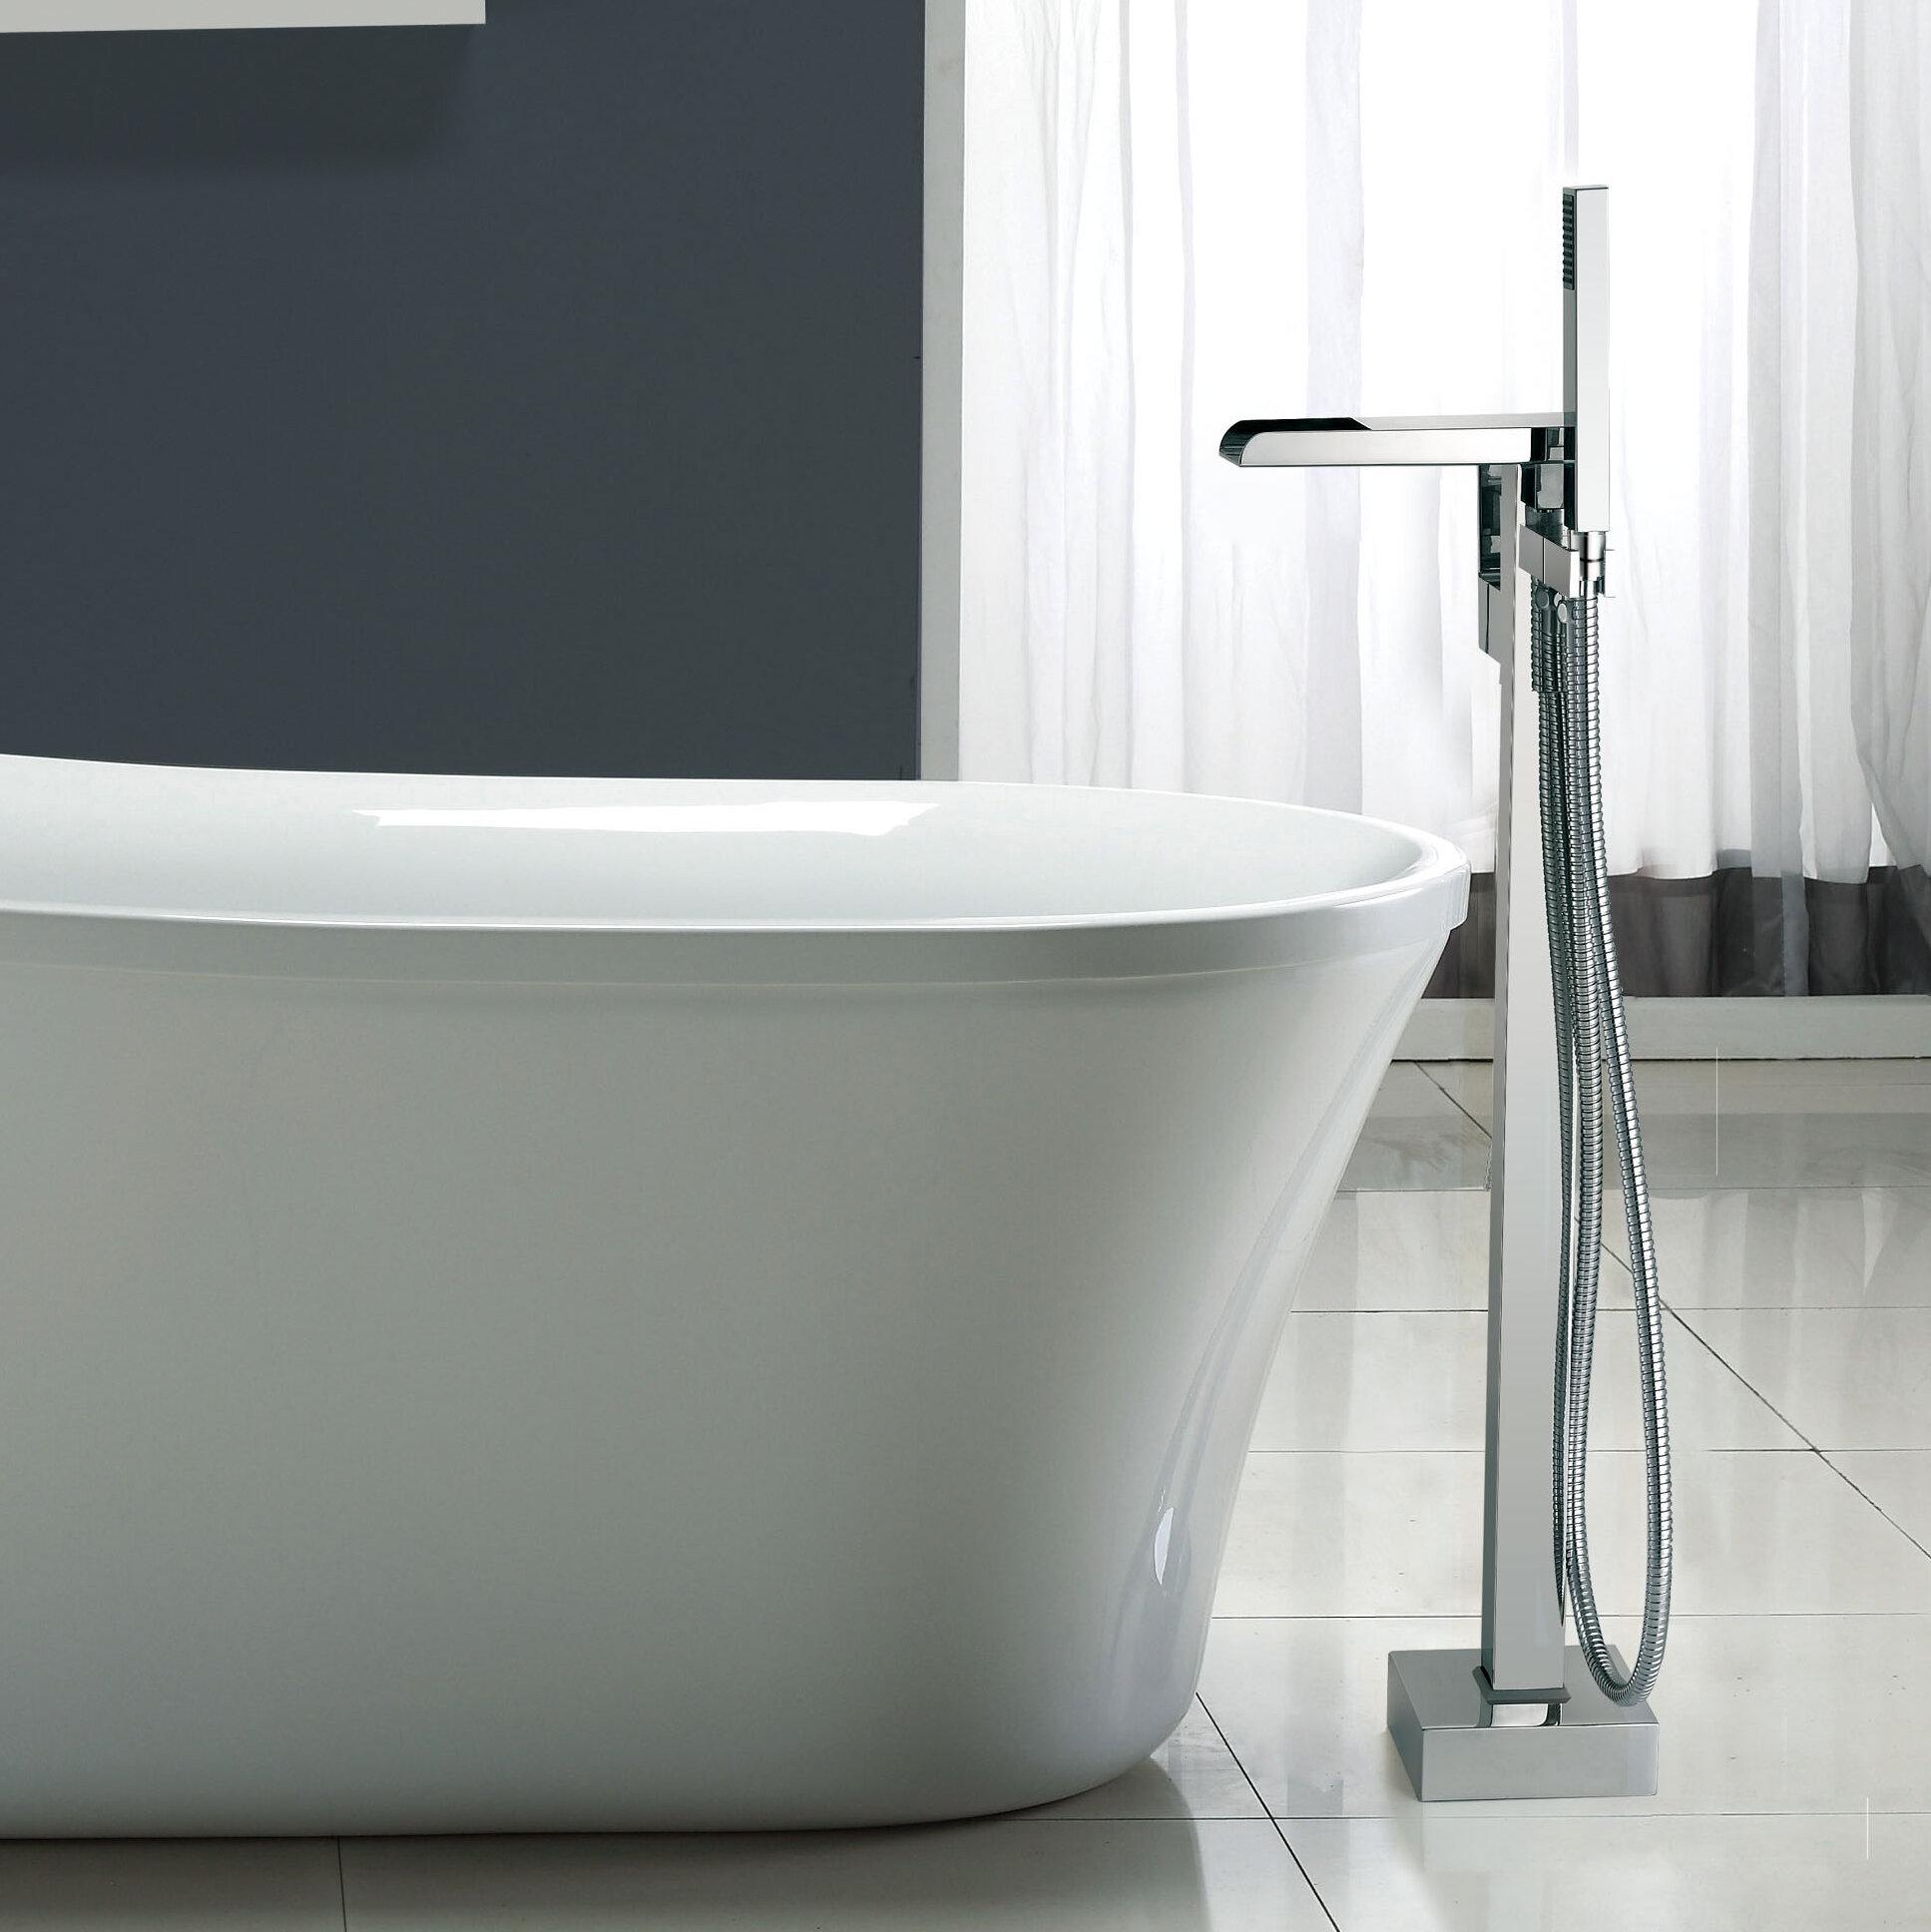 Bathtub Faucet.Infinity Floor Mounted Tub Faucet